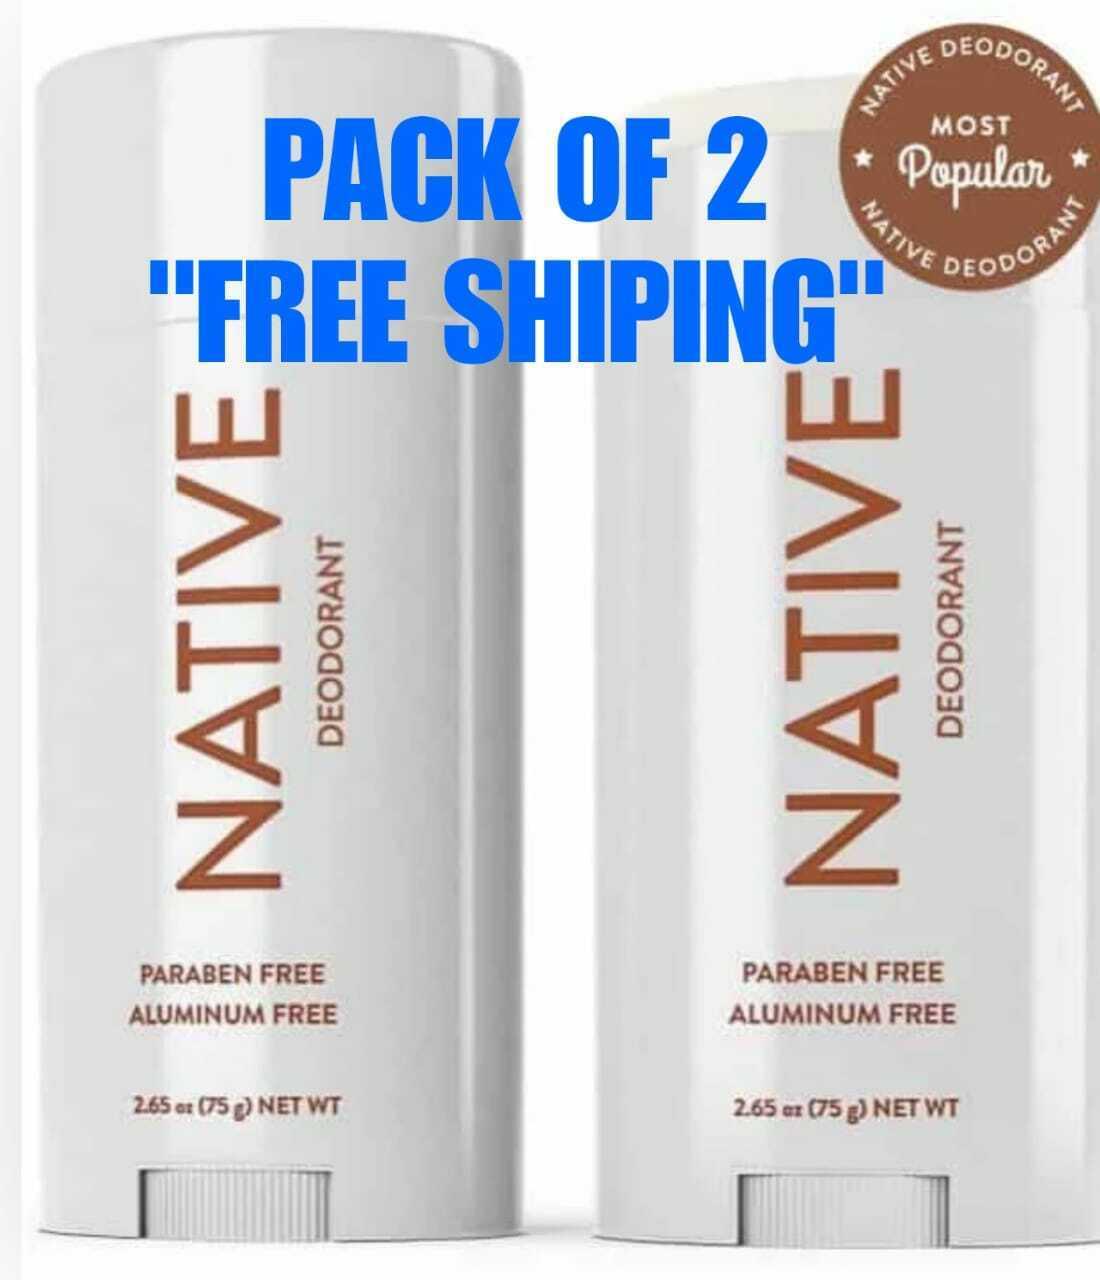 NATIVE DEODORANT COCONUT & VANILLA SCENT ALUMINUM FREE LONG